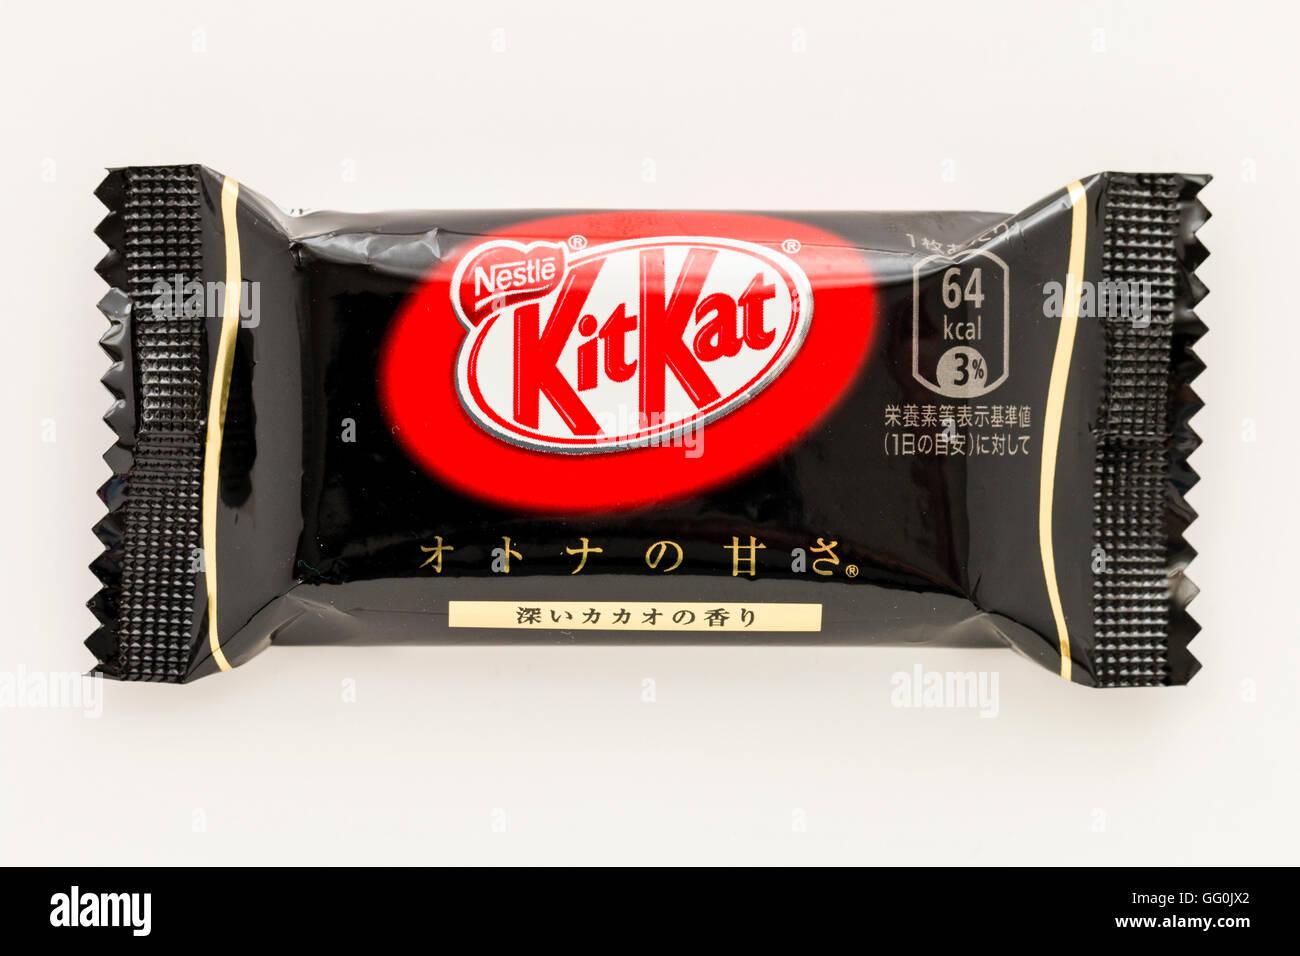 Candy Wrapper Chocolate Imágenes De Stock & Candy Wrapper Chocolate ...